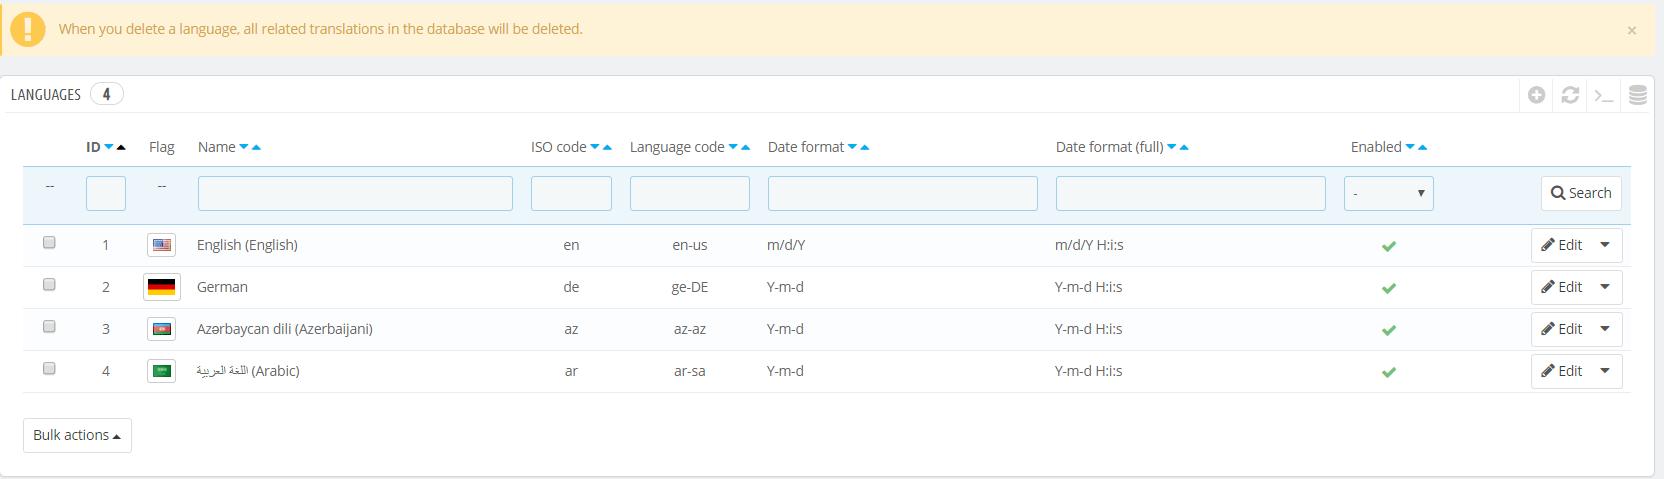 add update a language 4 new